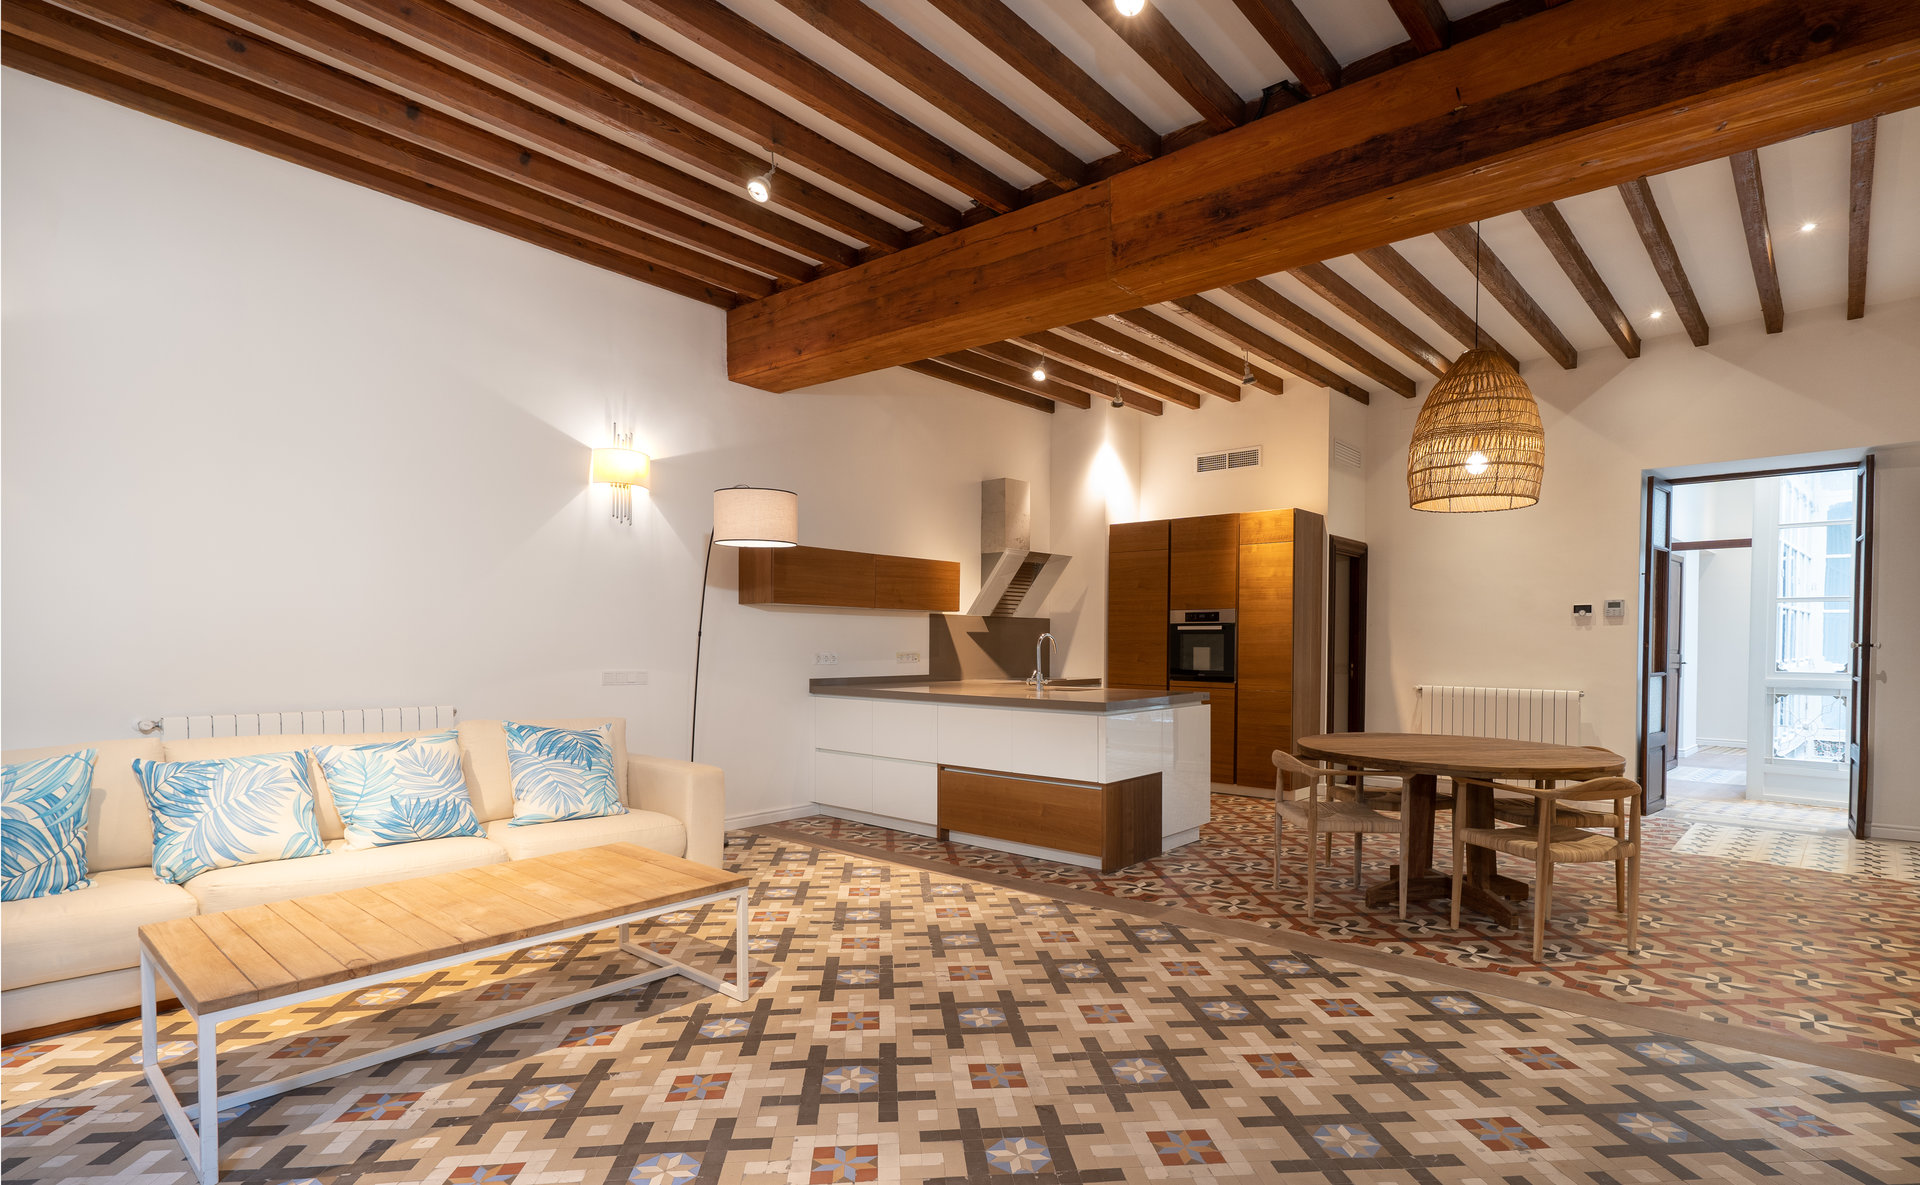 Ad Sale Apartment Palma de Mallorca Casco Antiguo (07001 ...